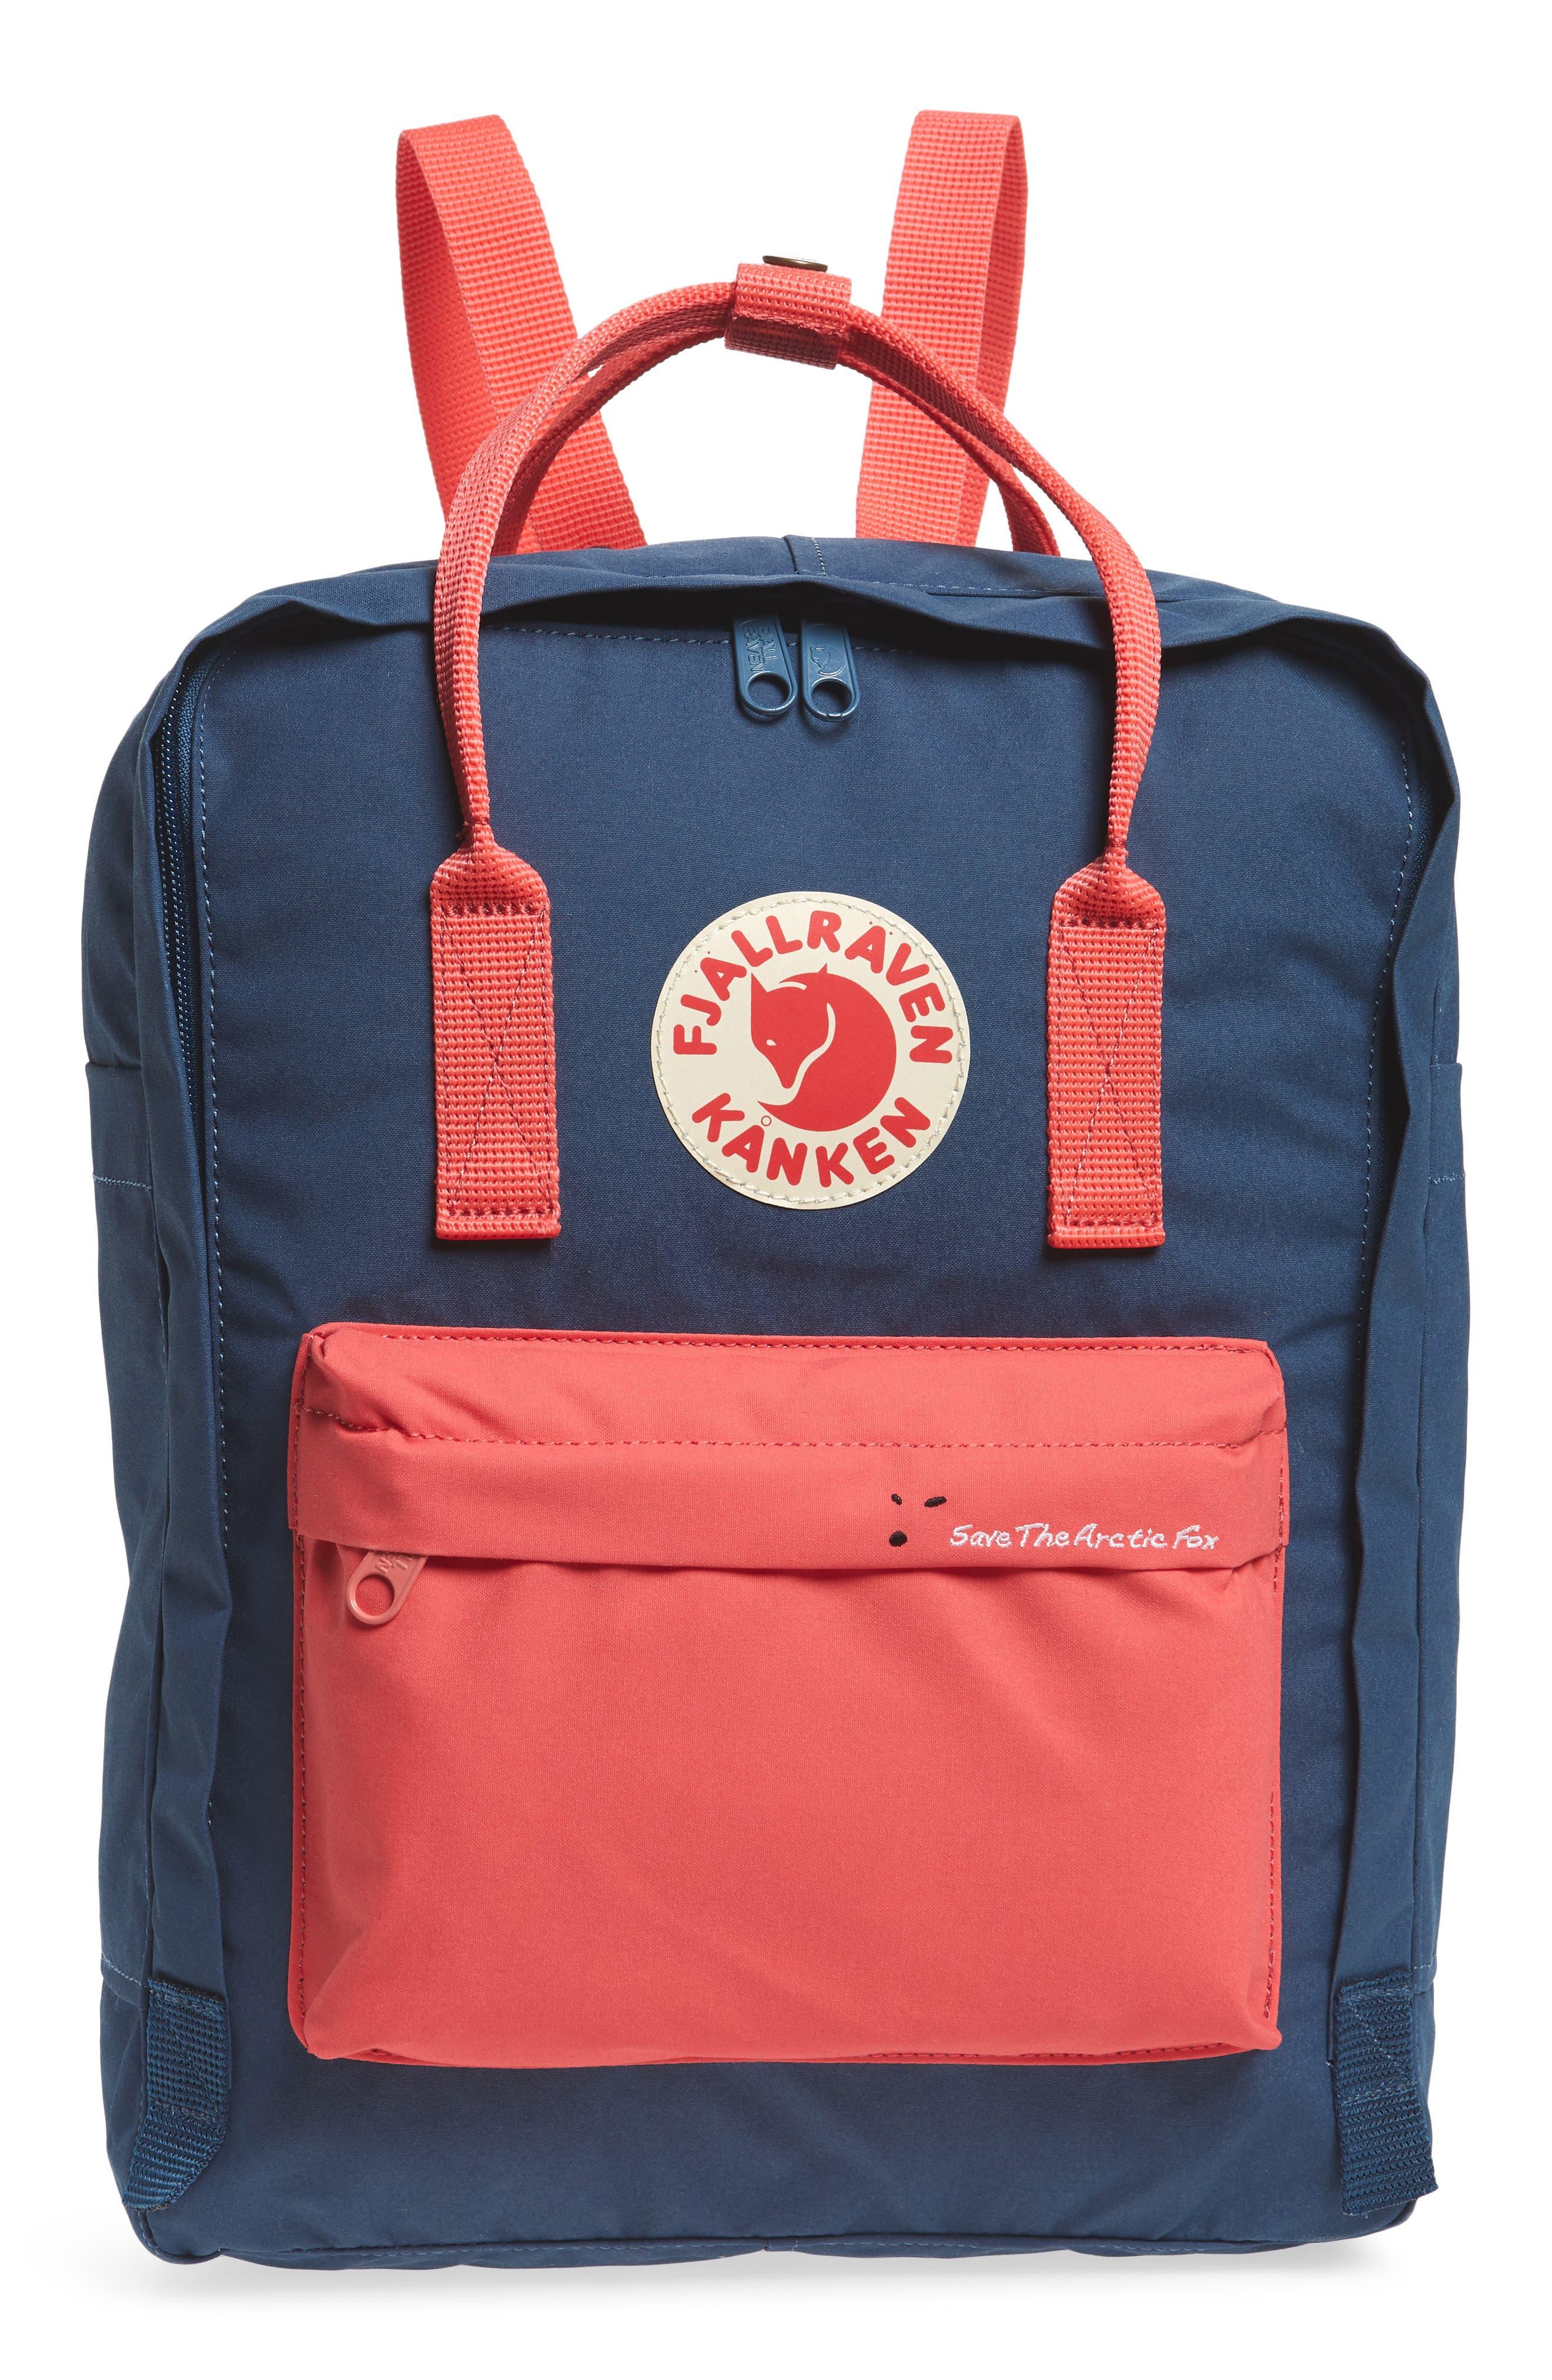 Arctic Fox Kånken Backpack,                         Main,                         color, ROYAL BLUE/ PEACH PINK